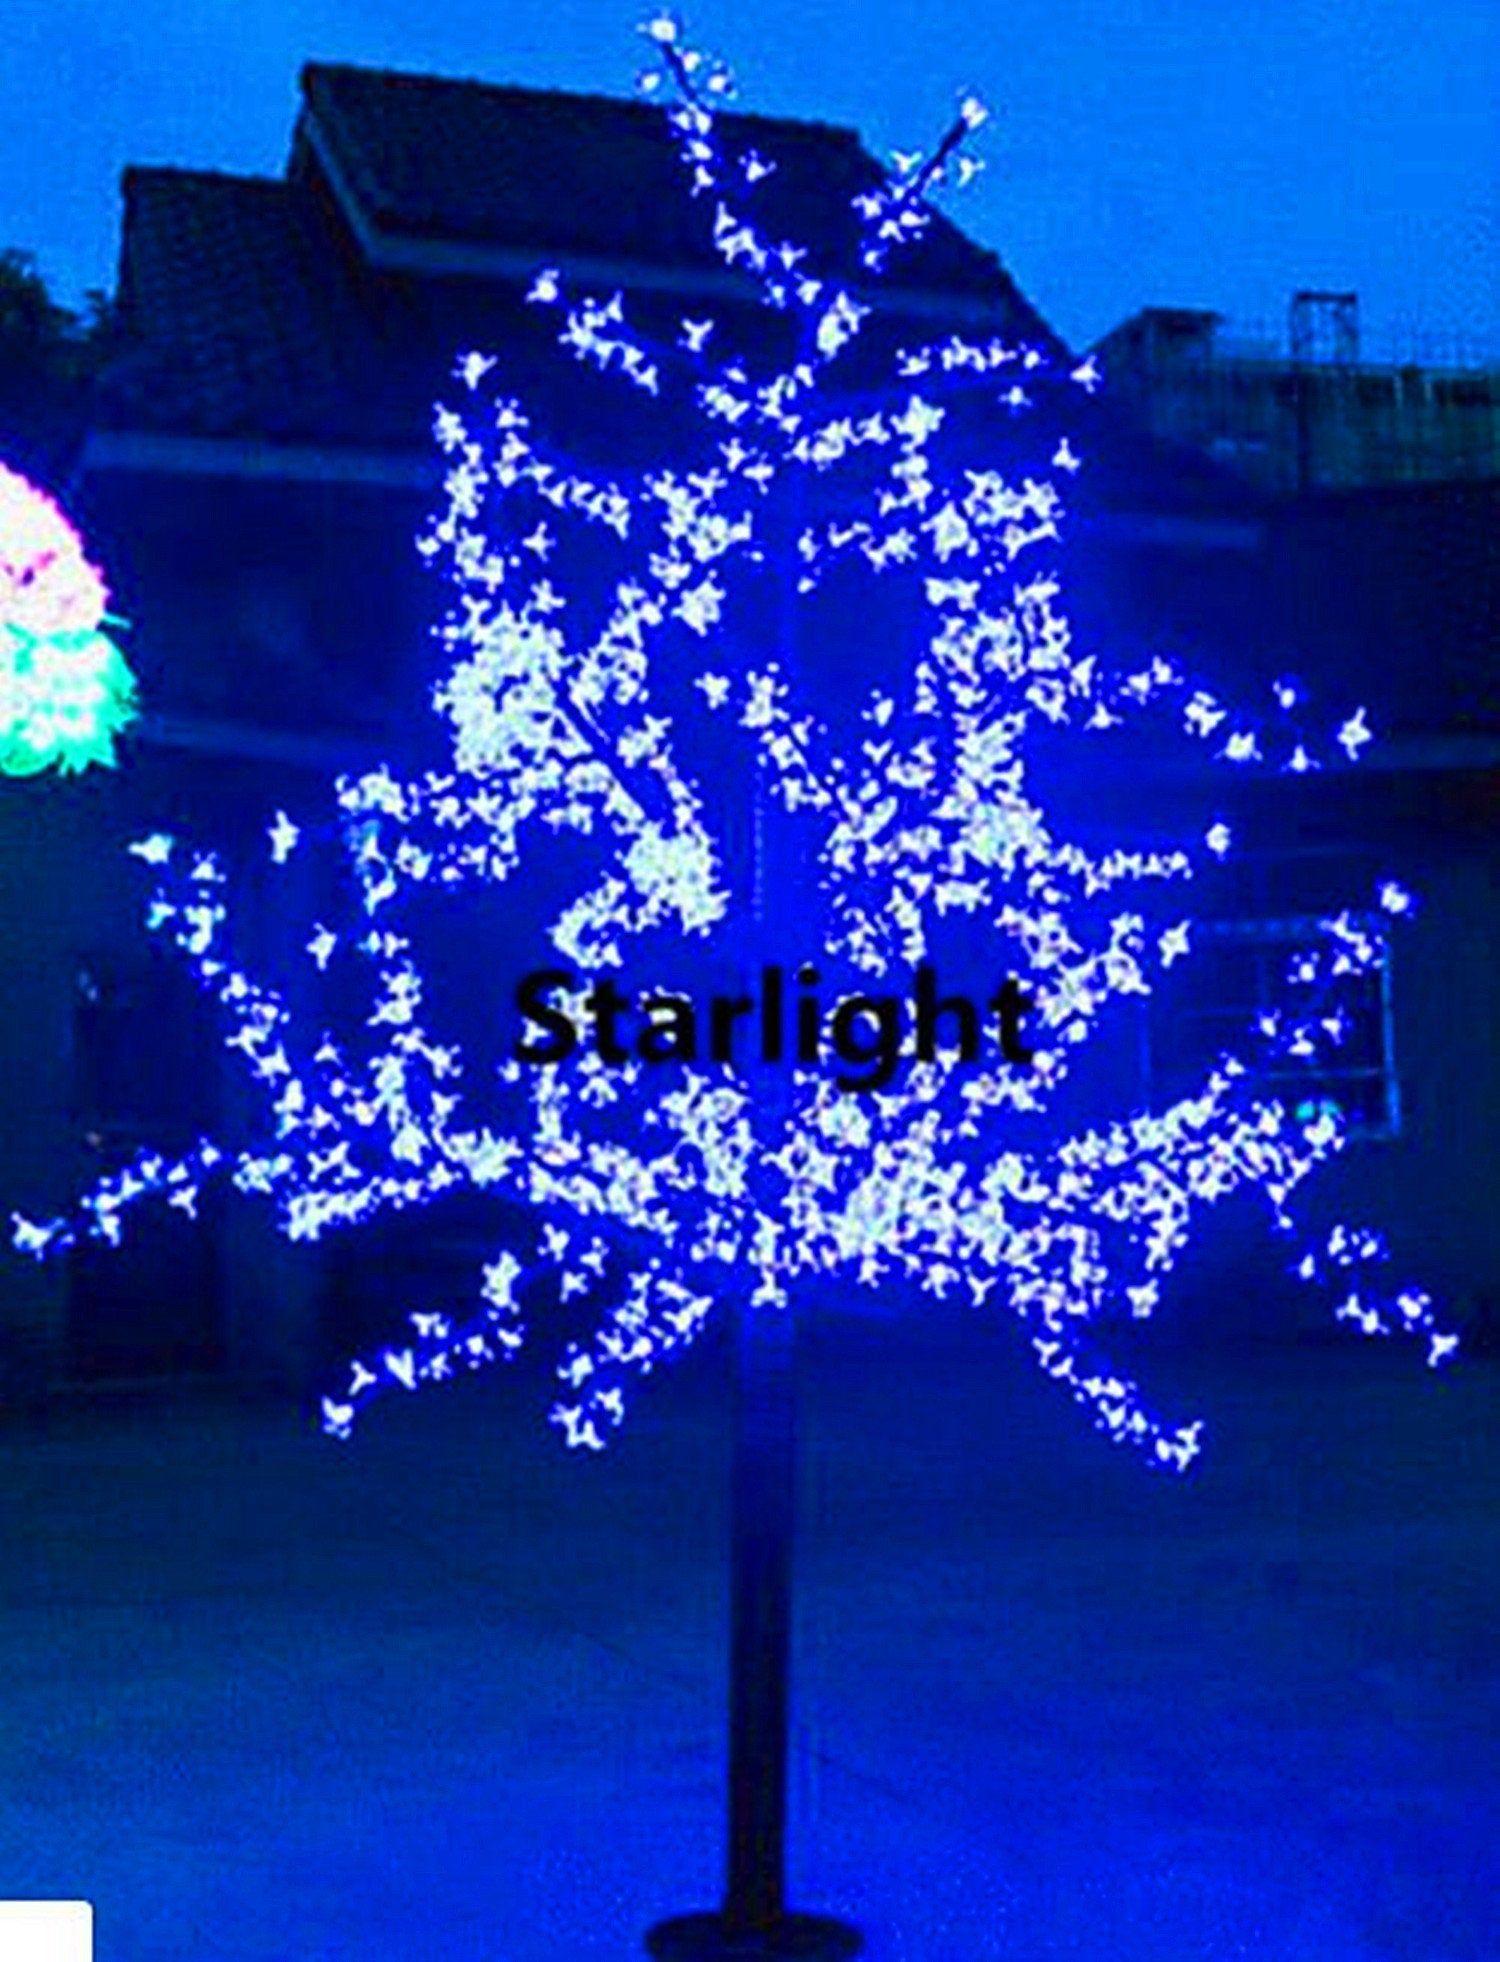 864pcs Leds Outdoor 6 5ft 2m Led Cherry Blossom Tree Light Etsy In 2021 Blossom Trees Cherry Blossom Tree Artificial Cherry Blossom Tree